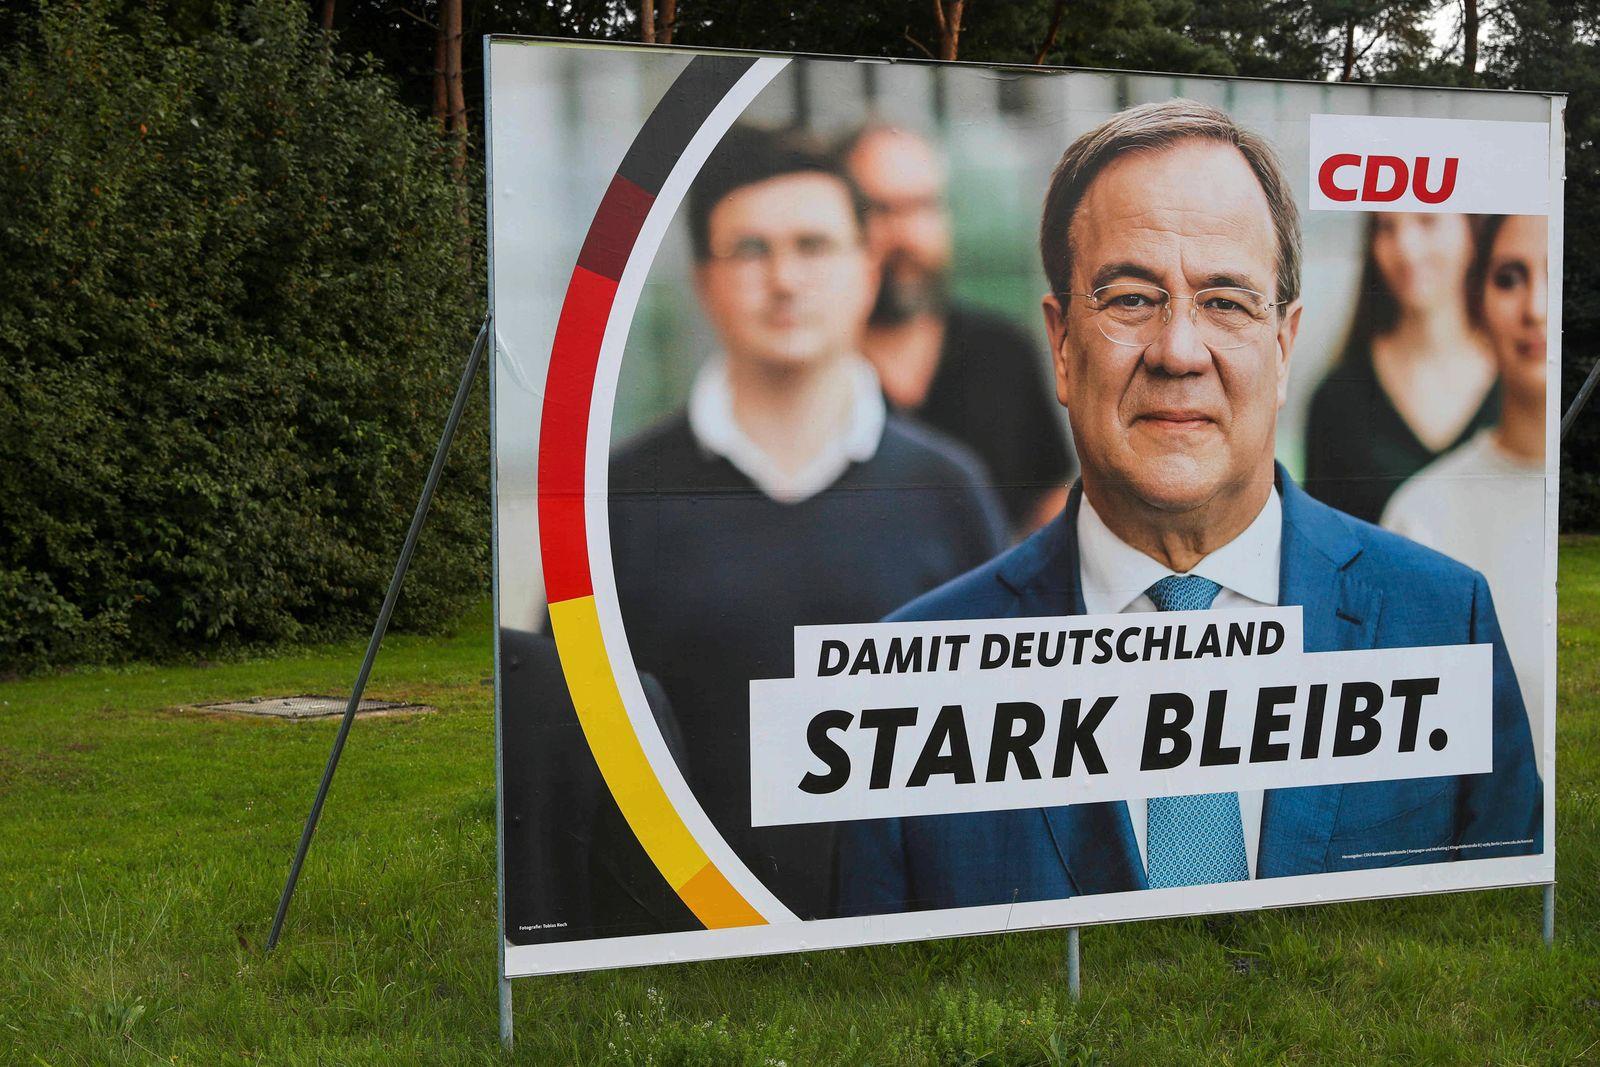 Wahlkampf 2021 - Wahlplakate CDU Plakat - Armin Laschet Foto: osnapix Wahlkampf 2021 - Wahlplakate *** election campaign